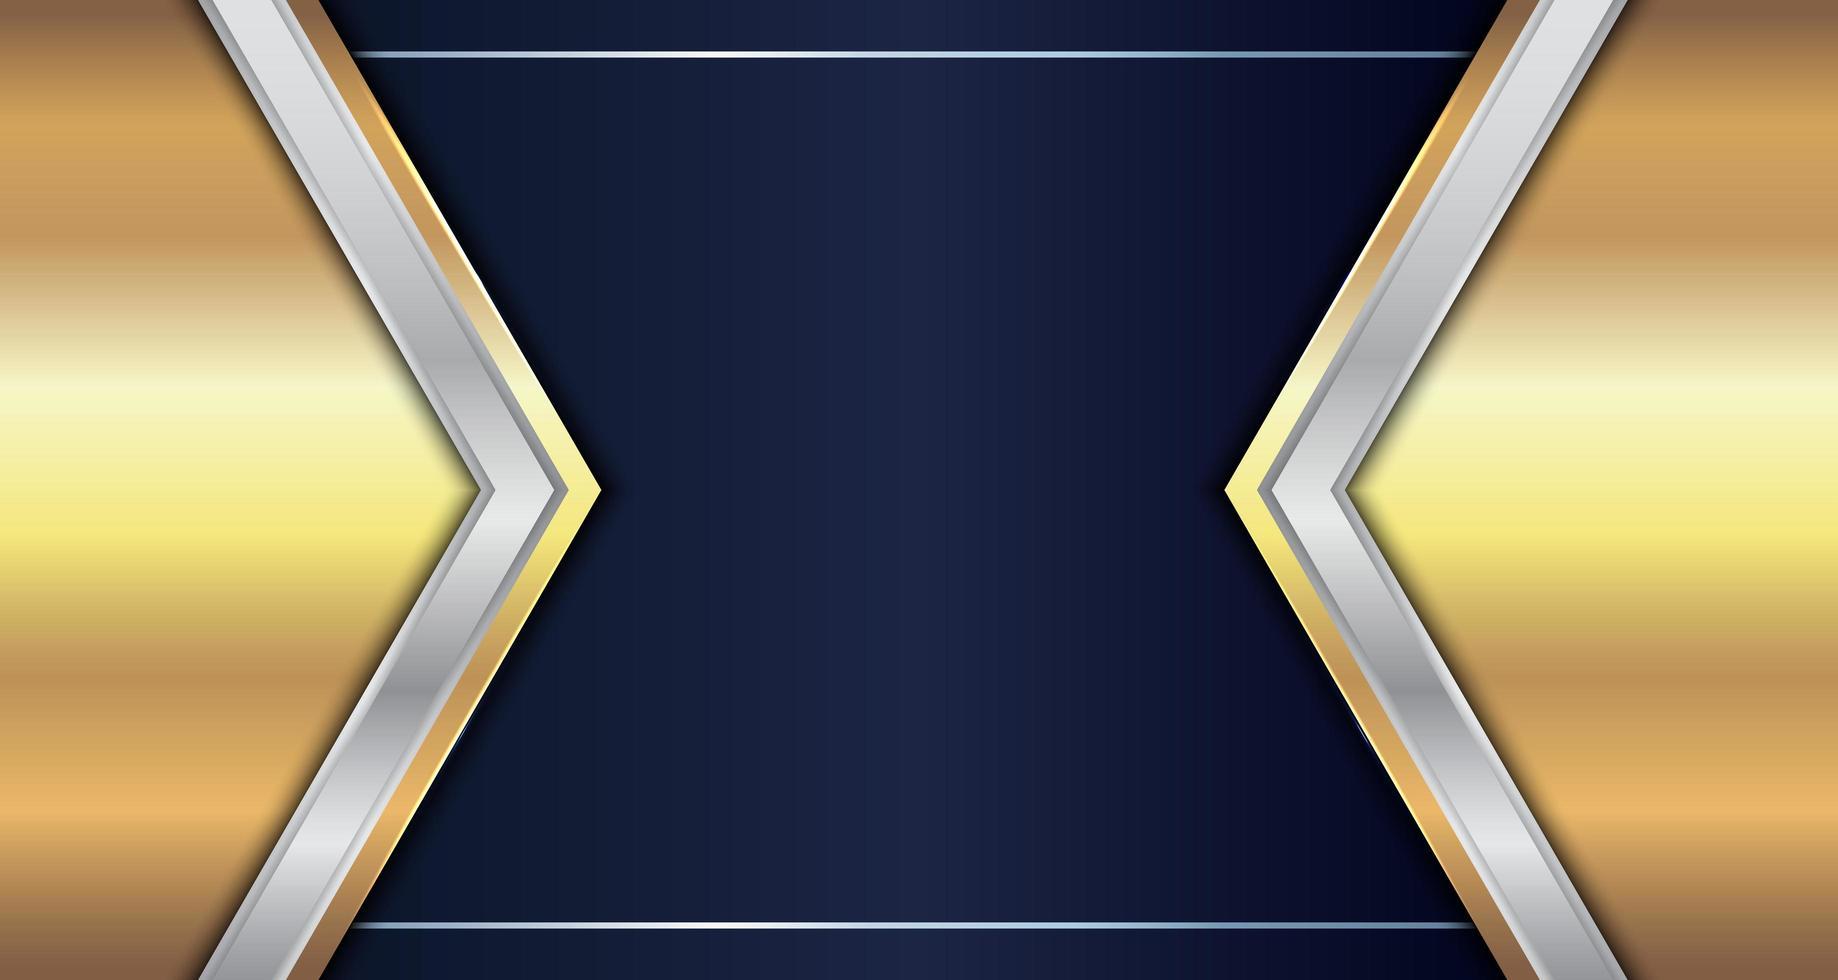 cabeçalho abstrato triângulo geométrico metálico de ouro e prata vetor